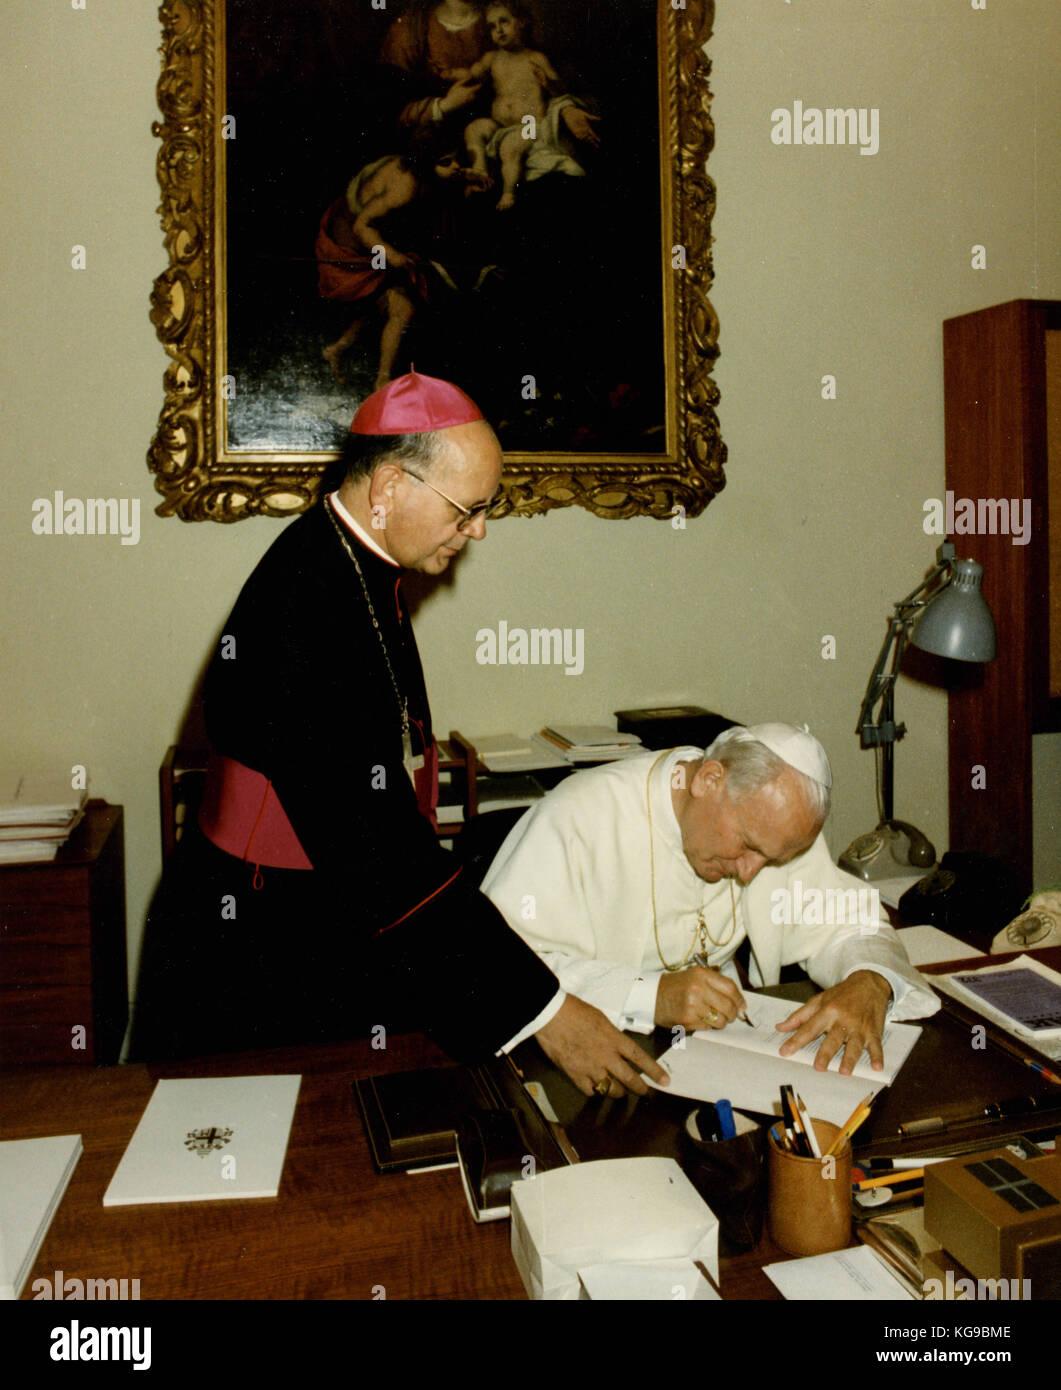 Pope John Paul I signing Dominus et Vivificantem Encyclical, 1986 - Stock Image